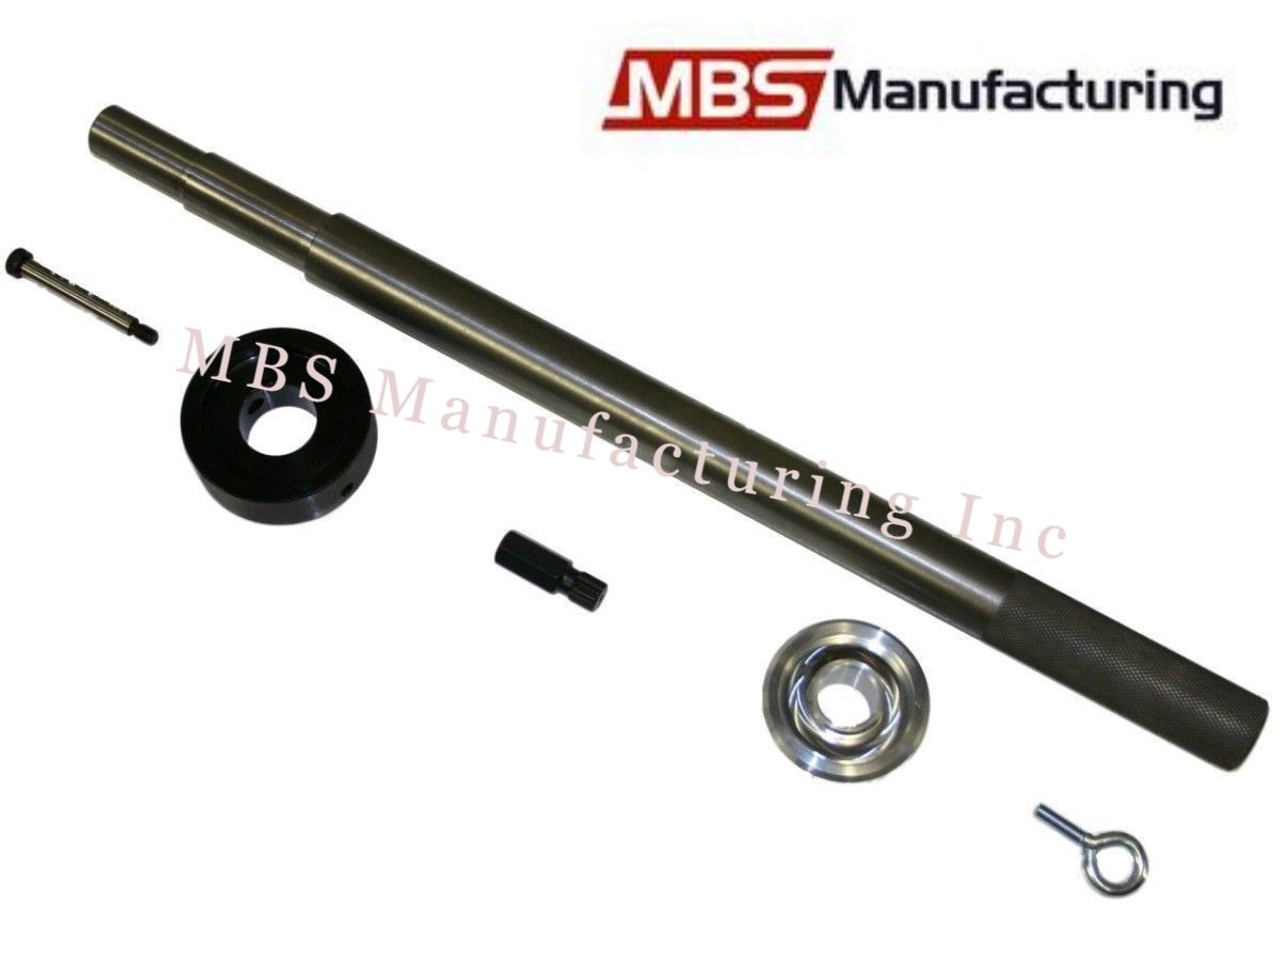 Alignment Bar Gimbal Bearing Seal Tool Set Mercruiser OMC Volvo SX 91-805475A1 (3pc & A23)